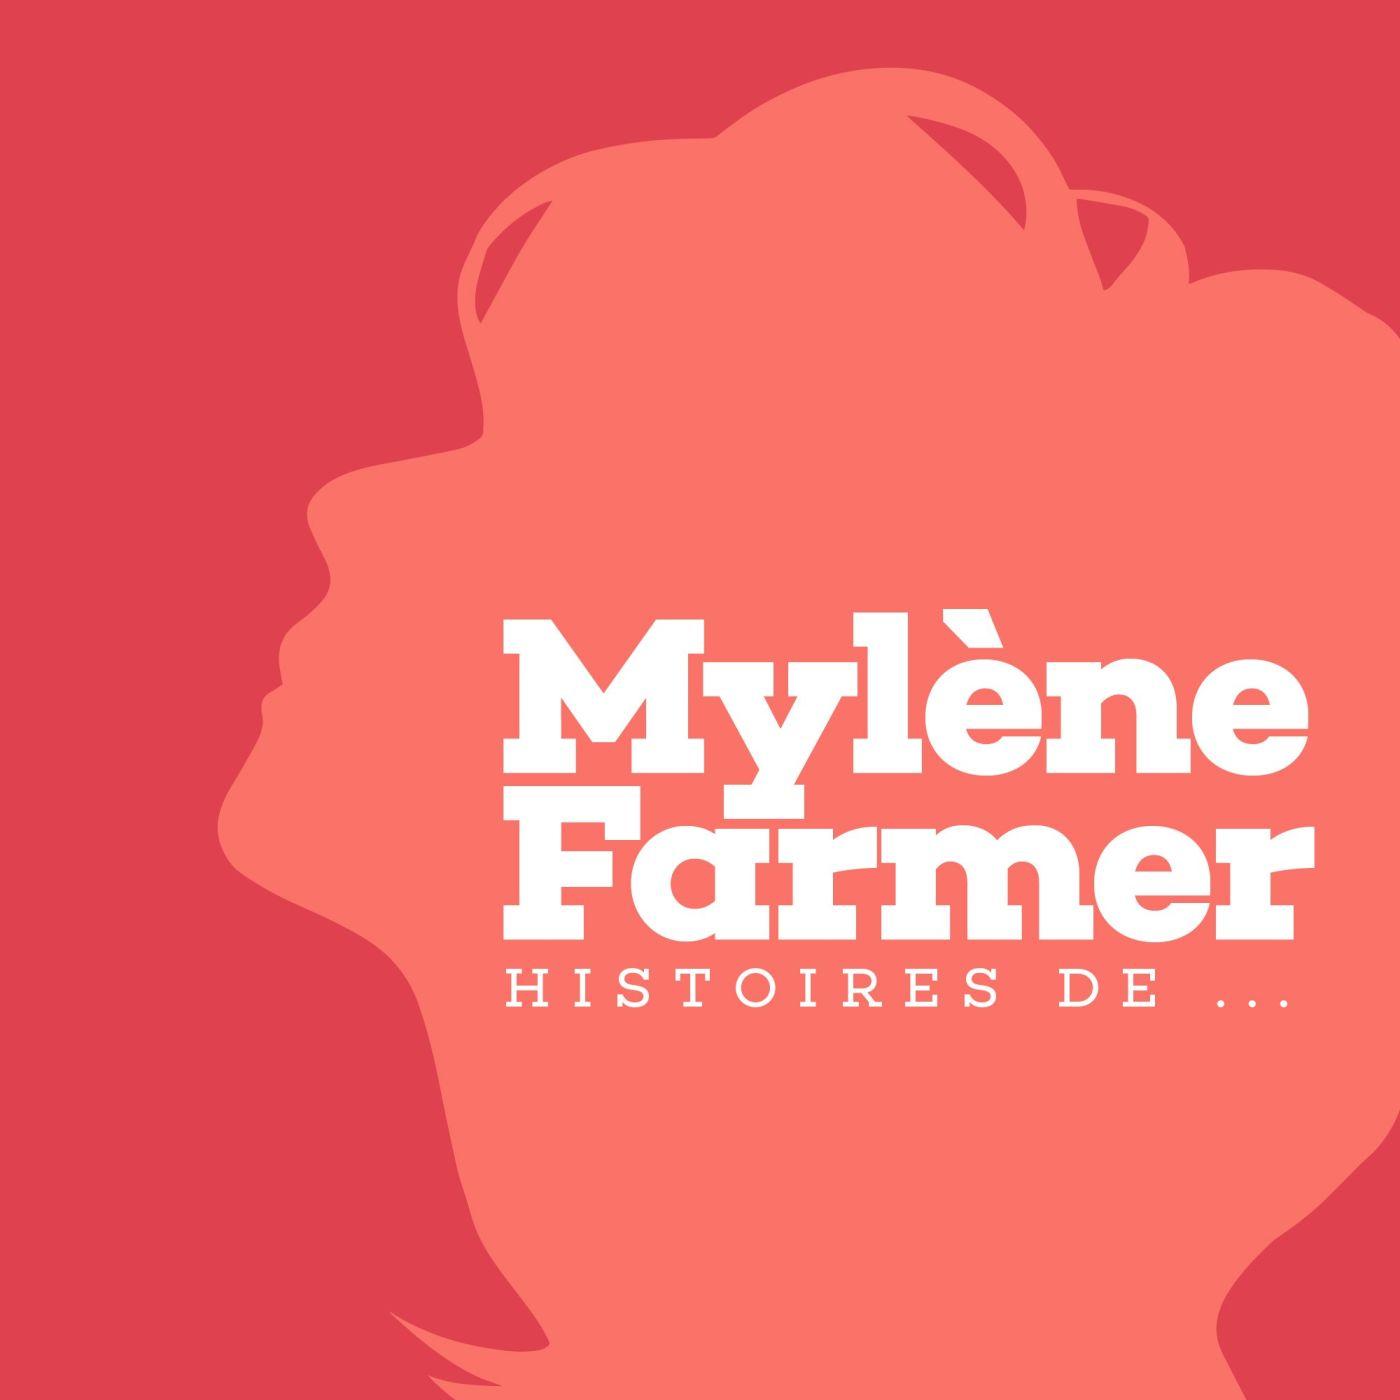 Mylène Farmer : histoires de...